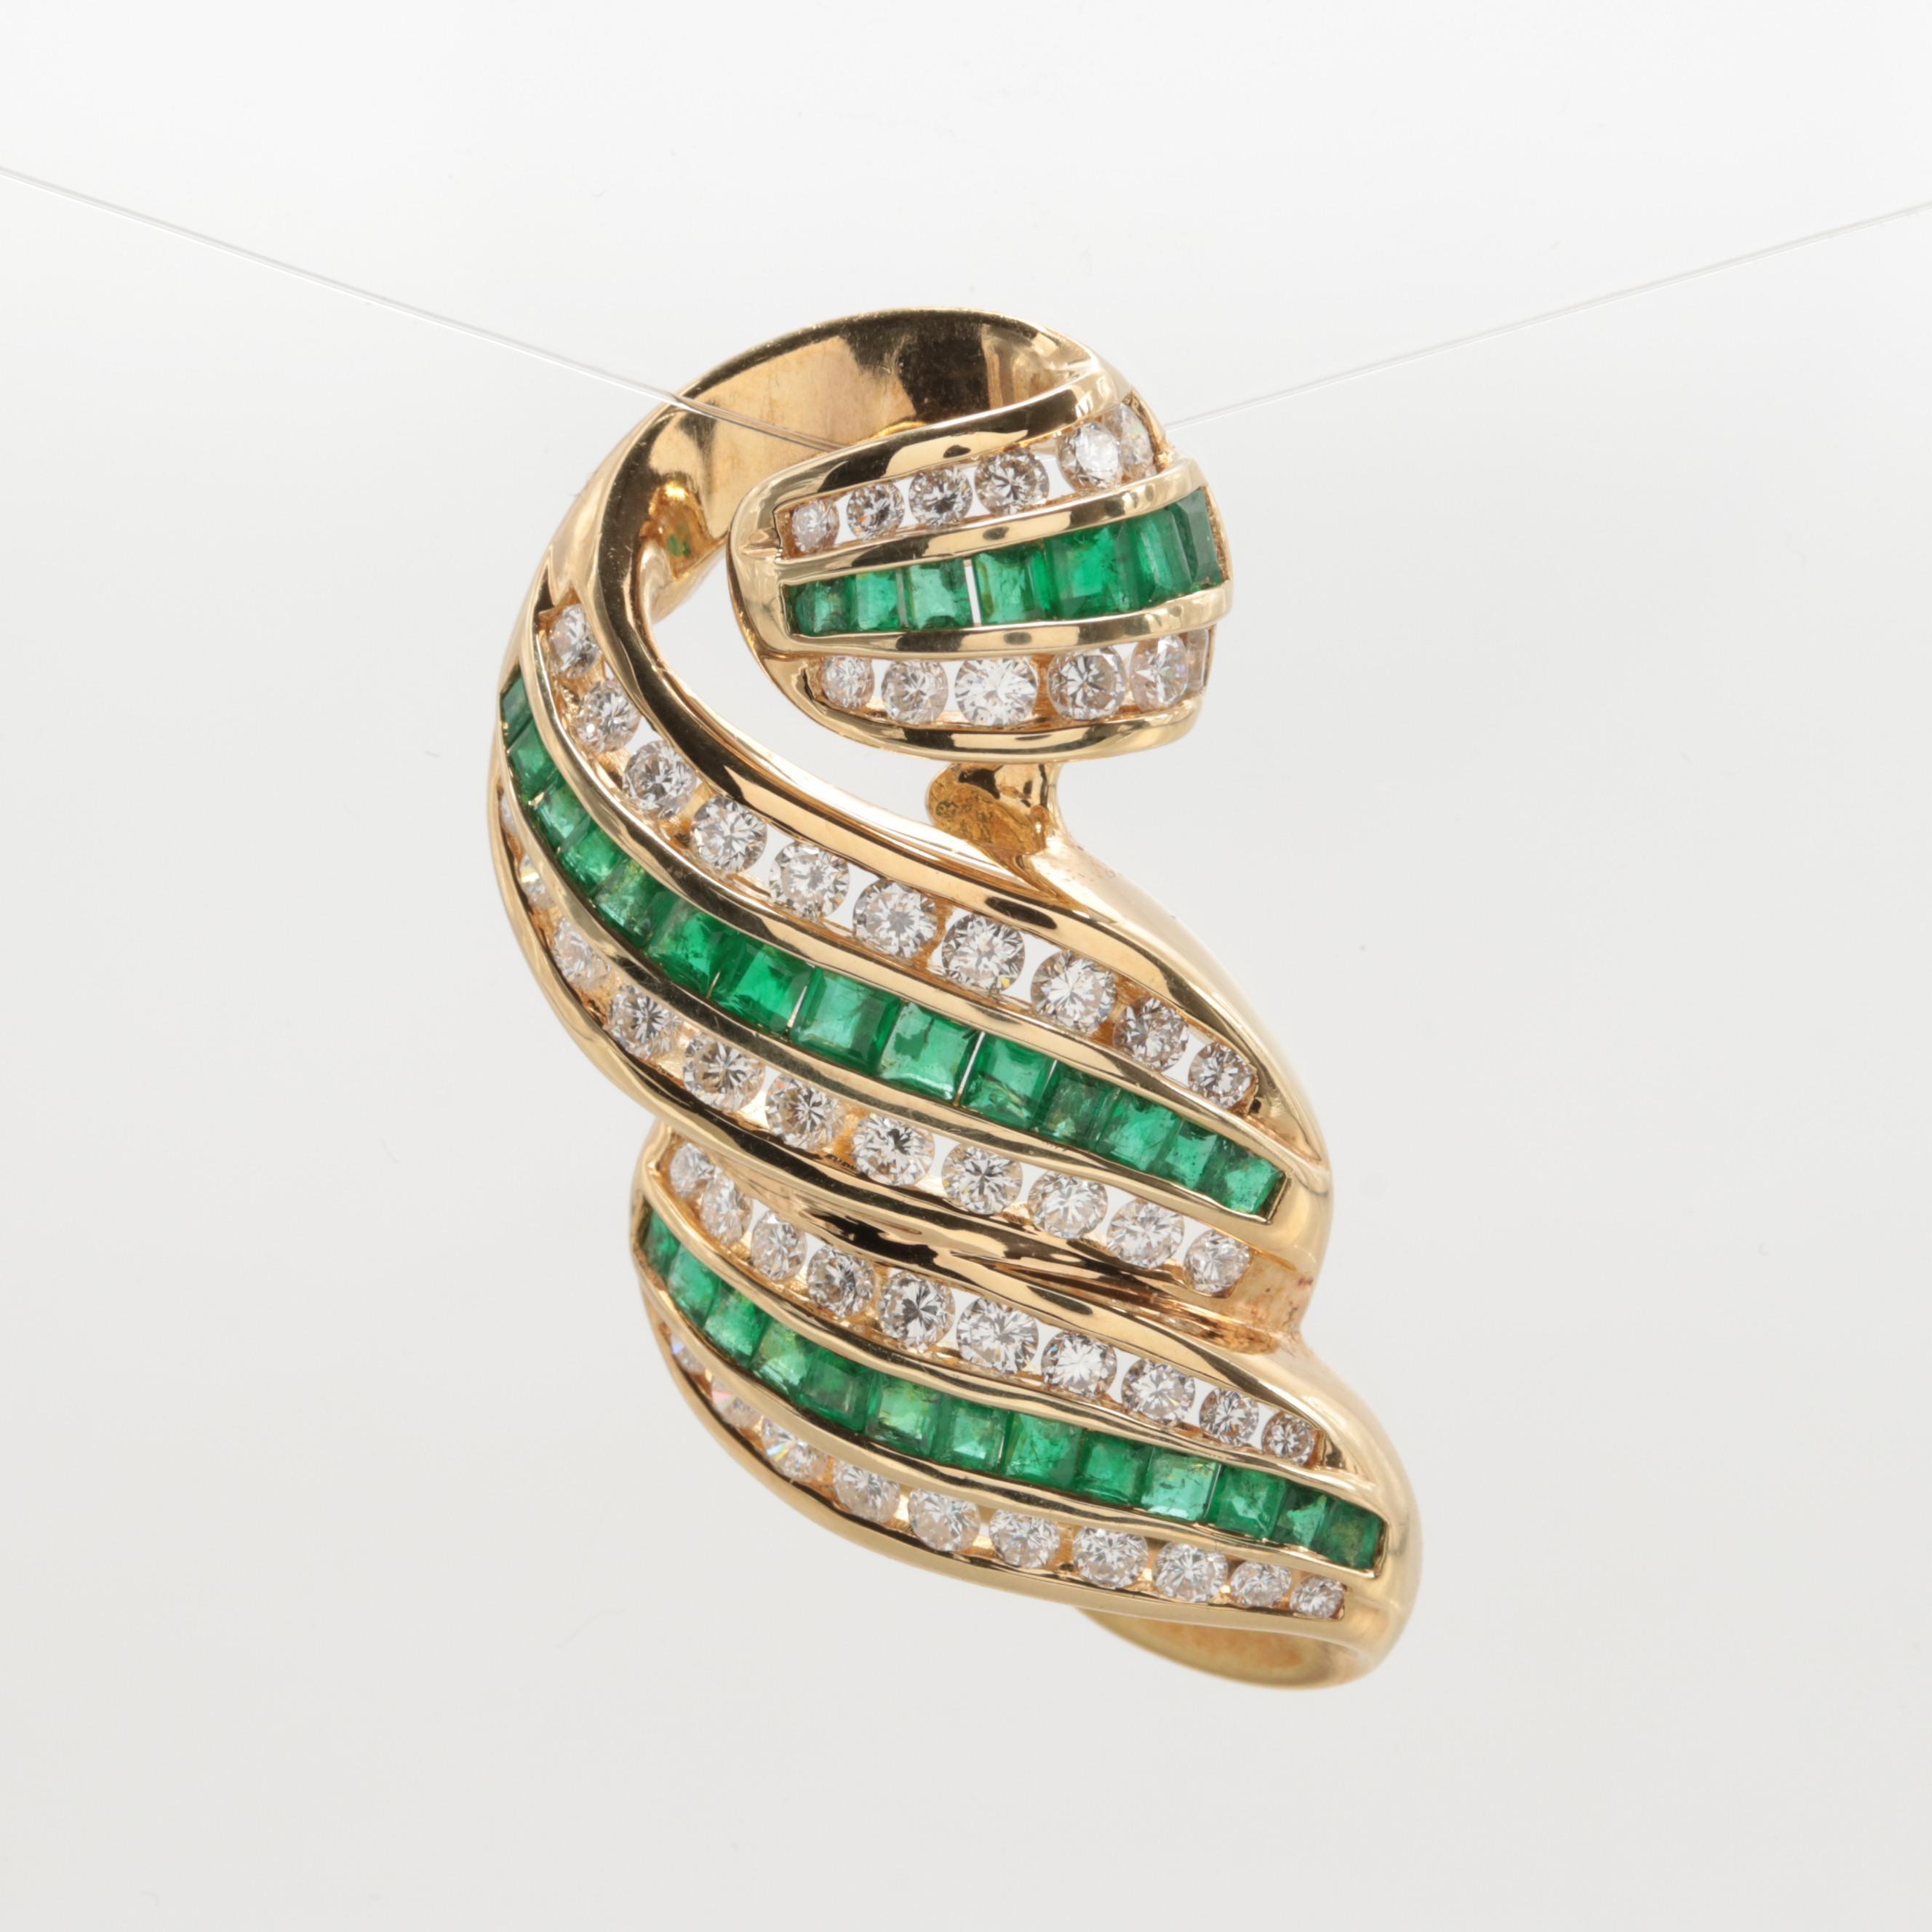 14K Yellow Gold Emerald and 1.75 CTW Diamond Pendant Slide